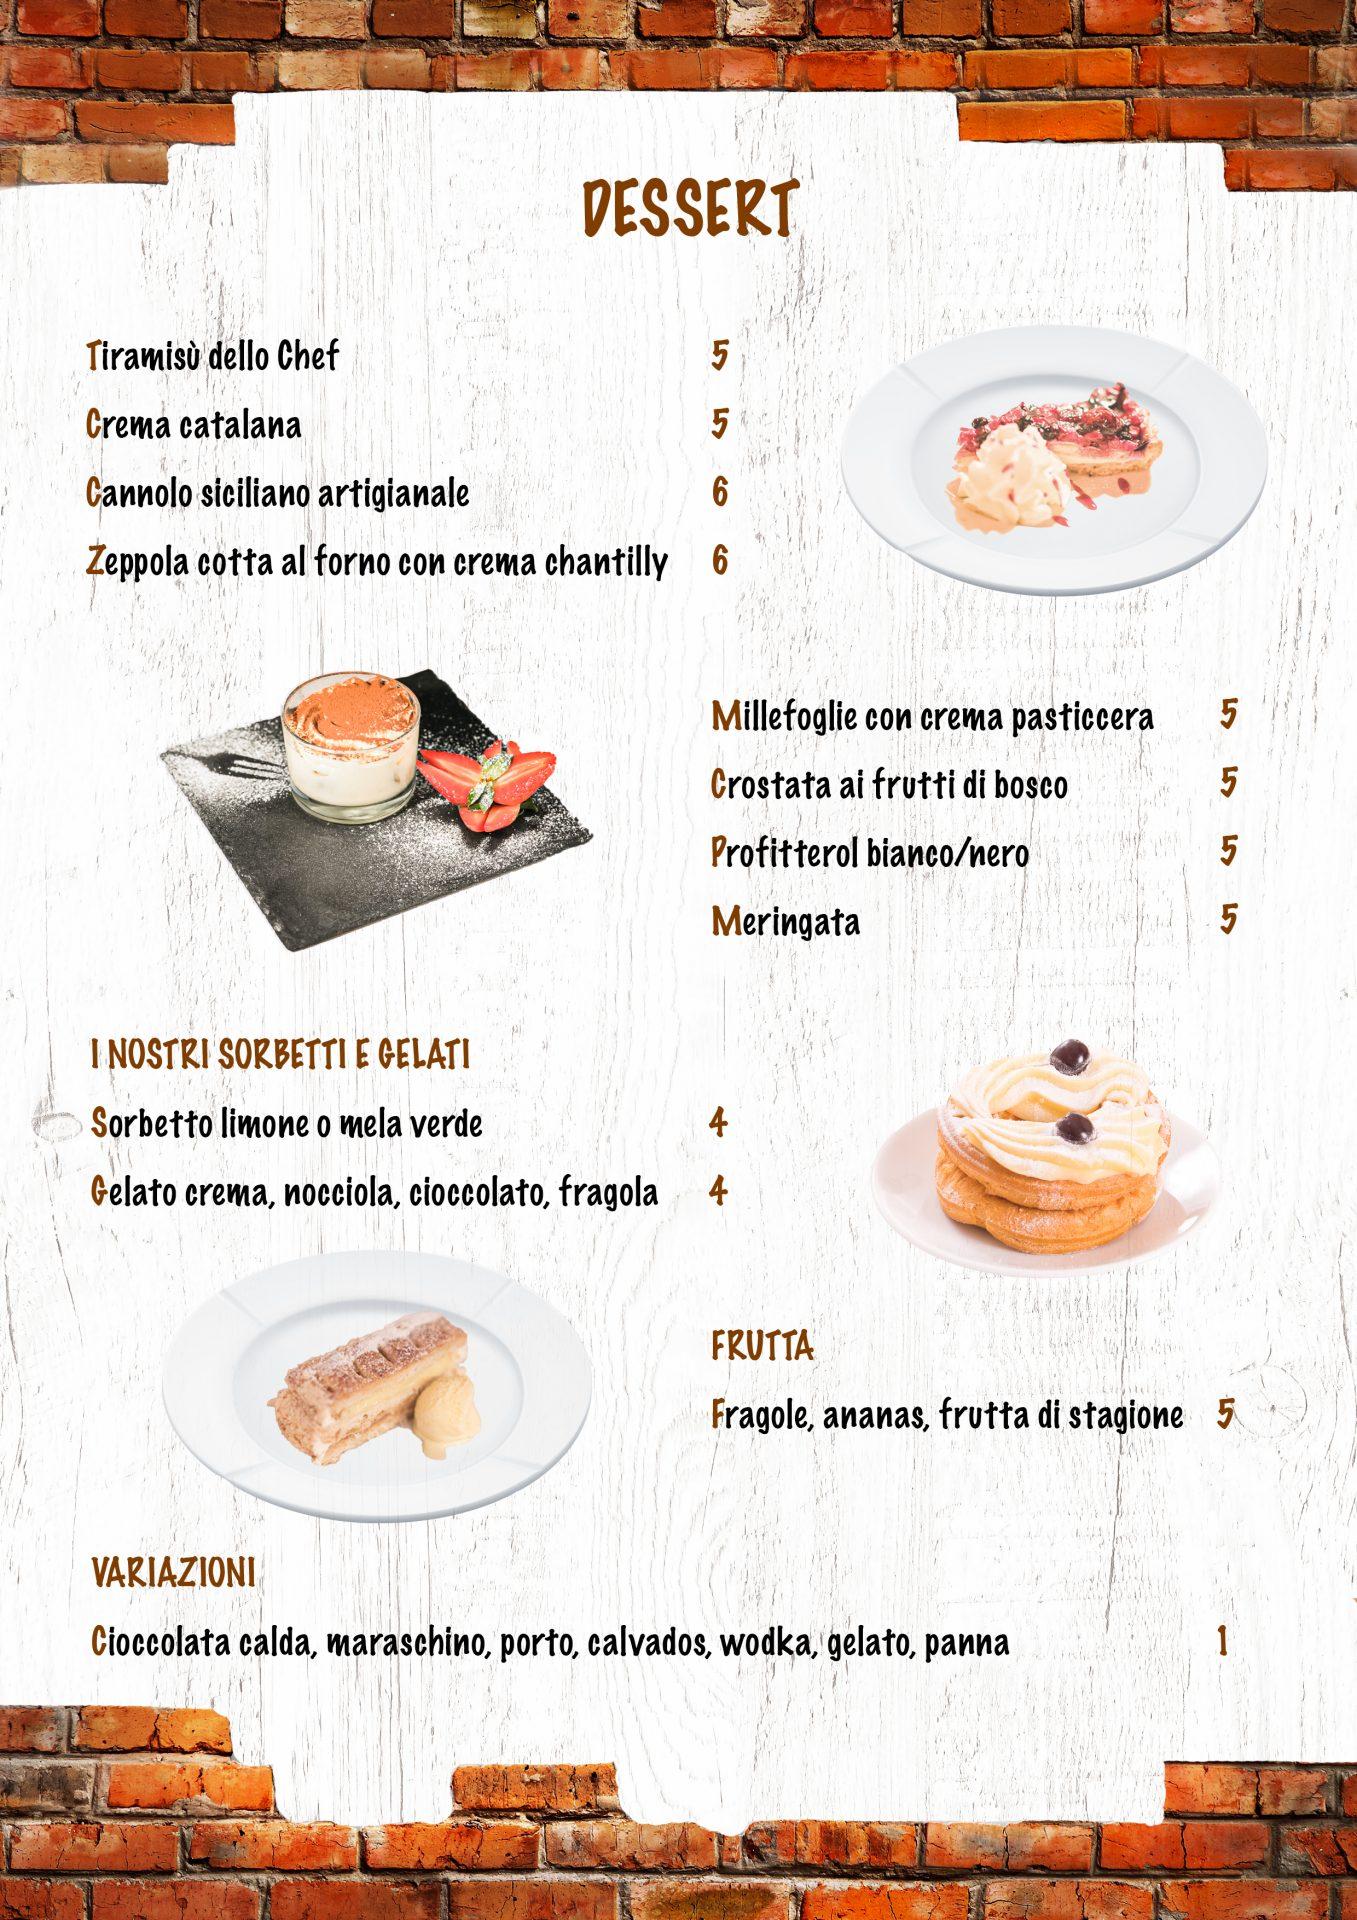 DESSERT menù casale 93-6